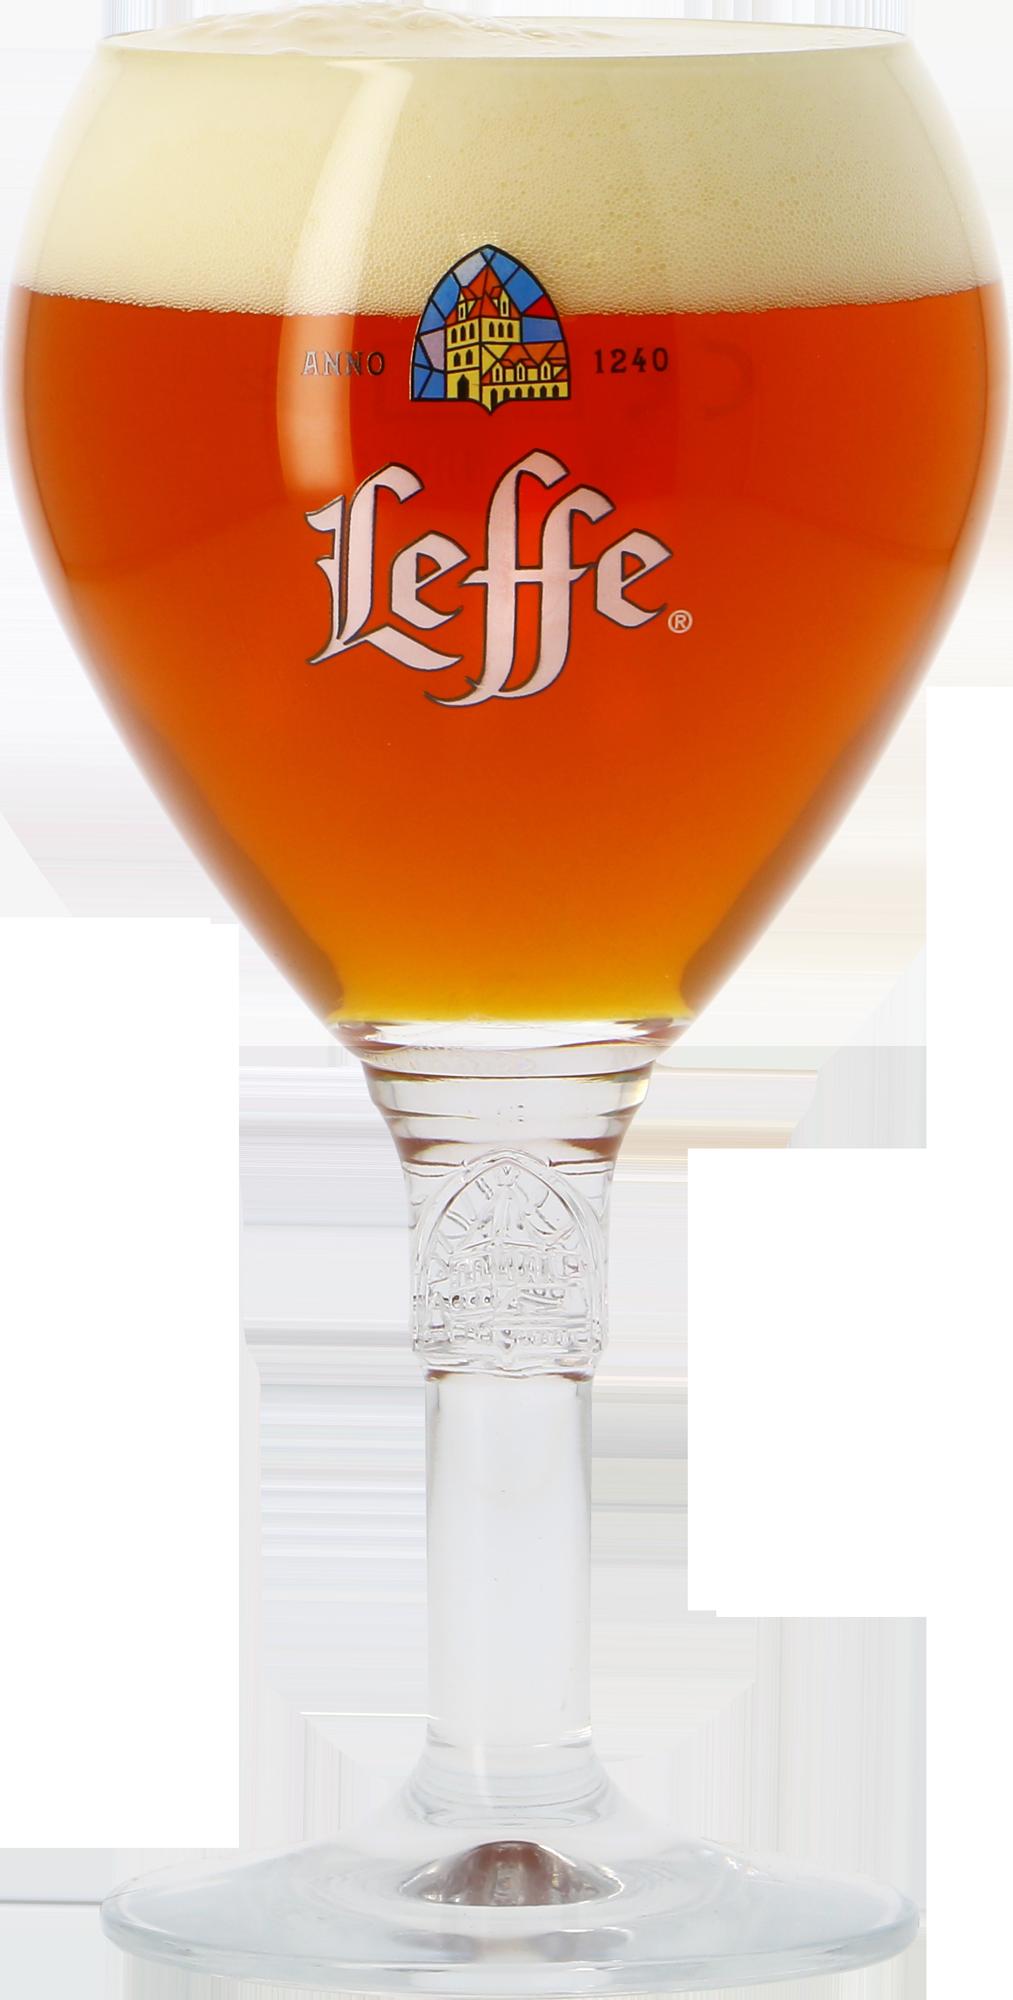 Copa cáliz Leffe  - 33cl